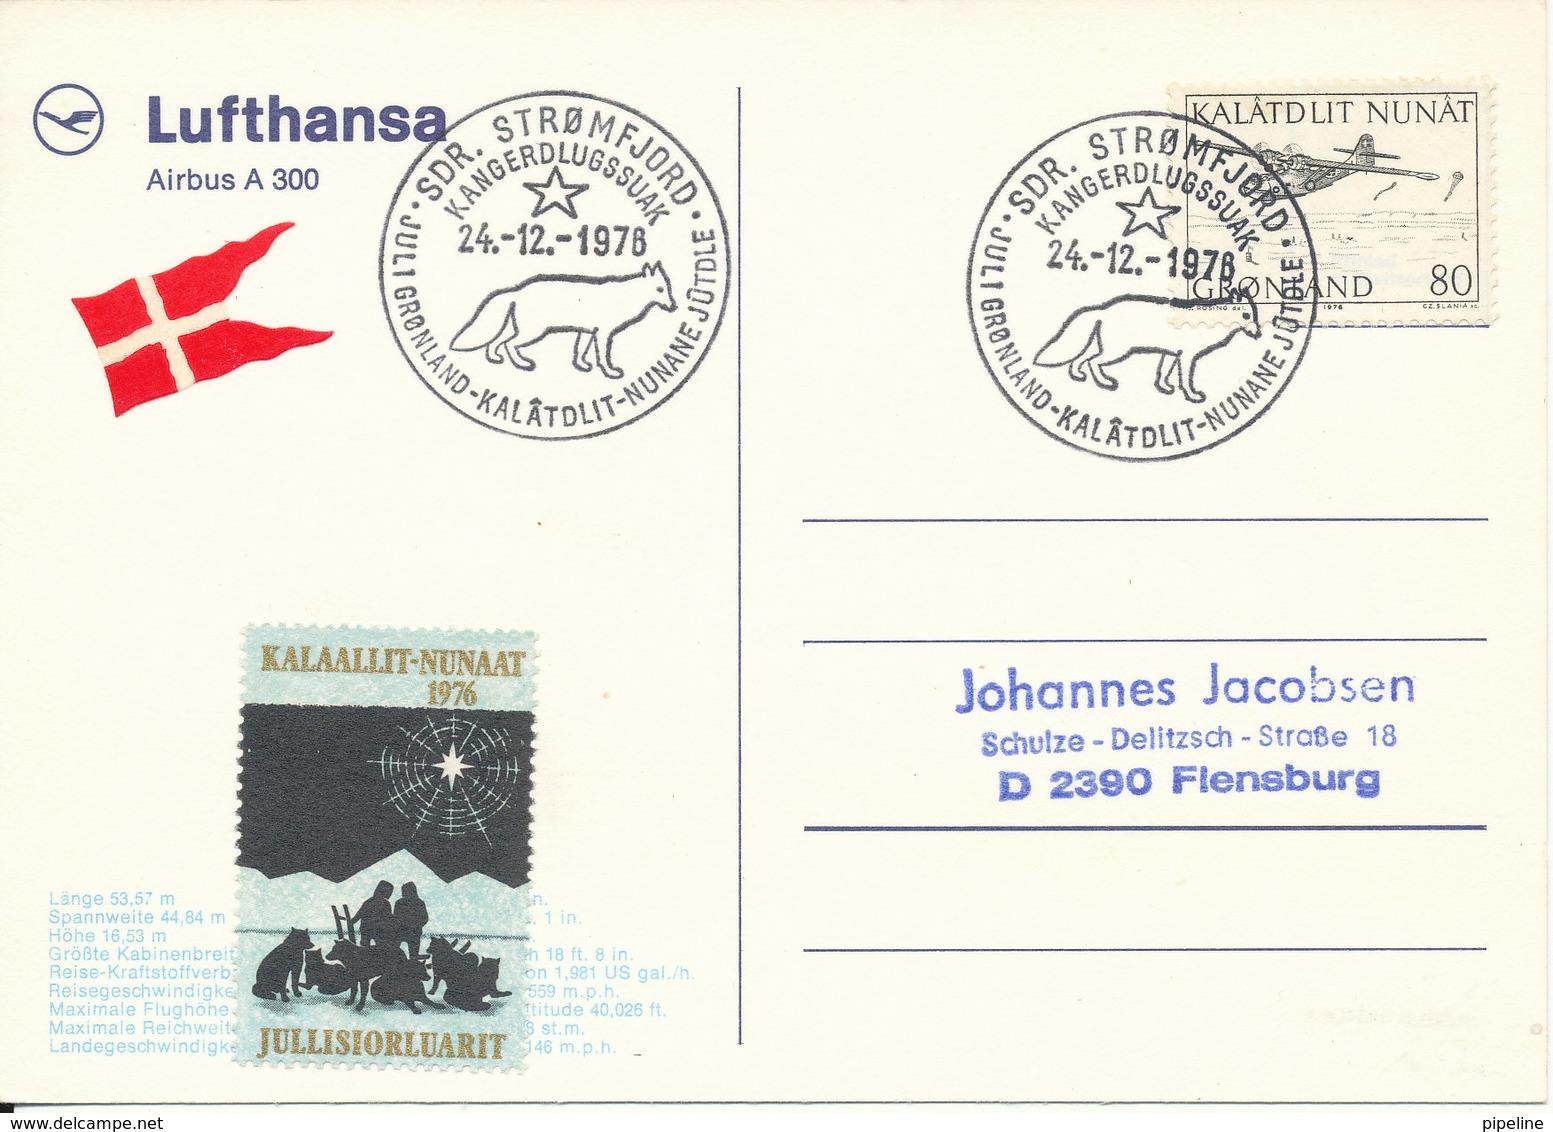 Greenland Postcard Sent To Germany Special Christmas Postmark Sdr. Strömfjord 24-12-1976 (Lufthansa A 300) - Greenland